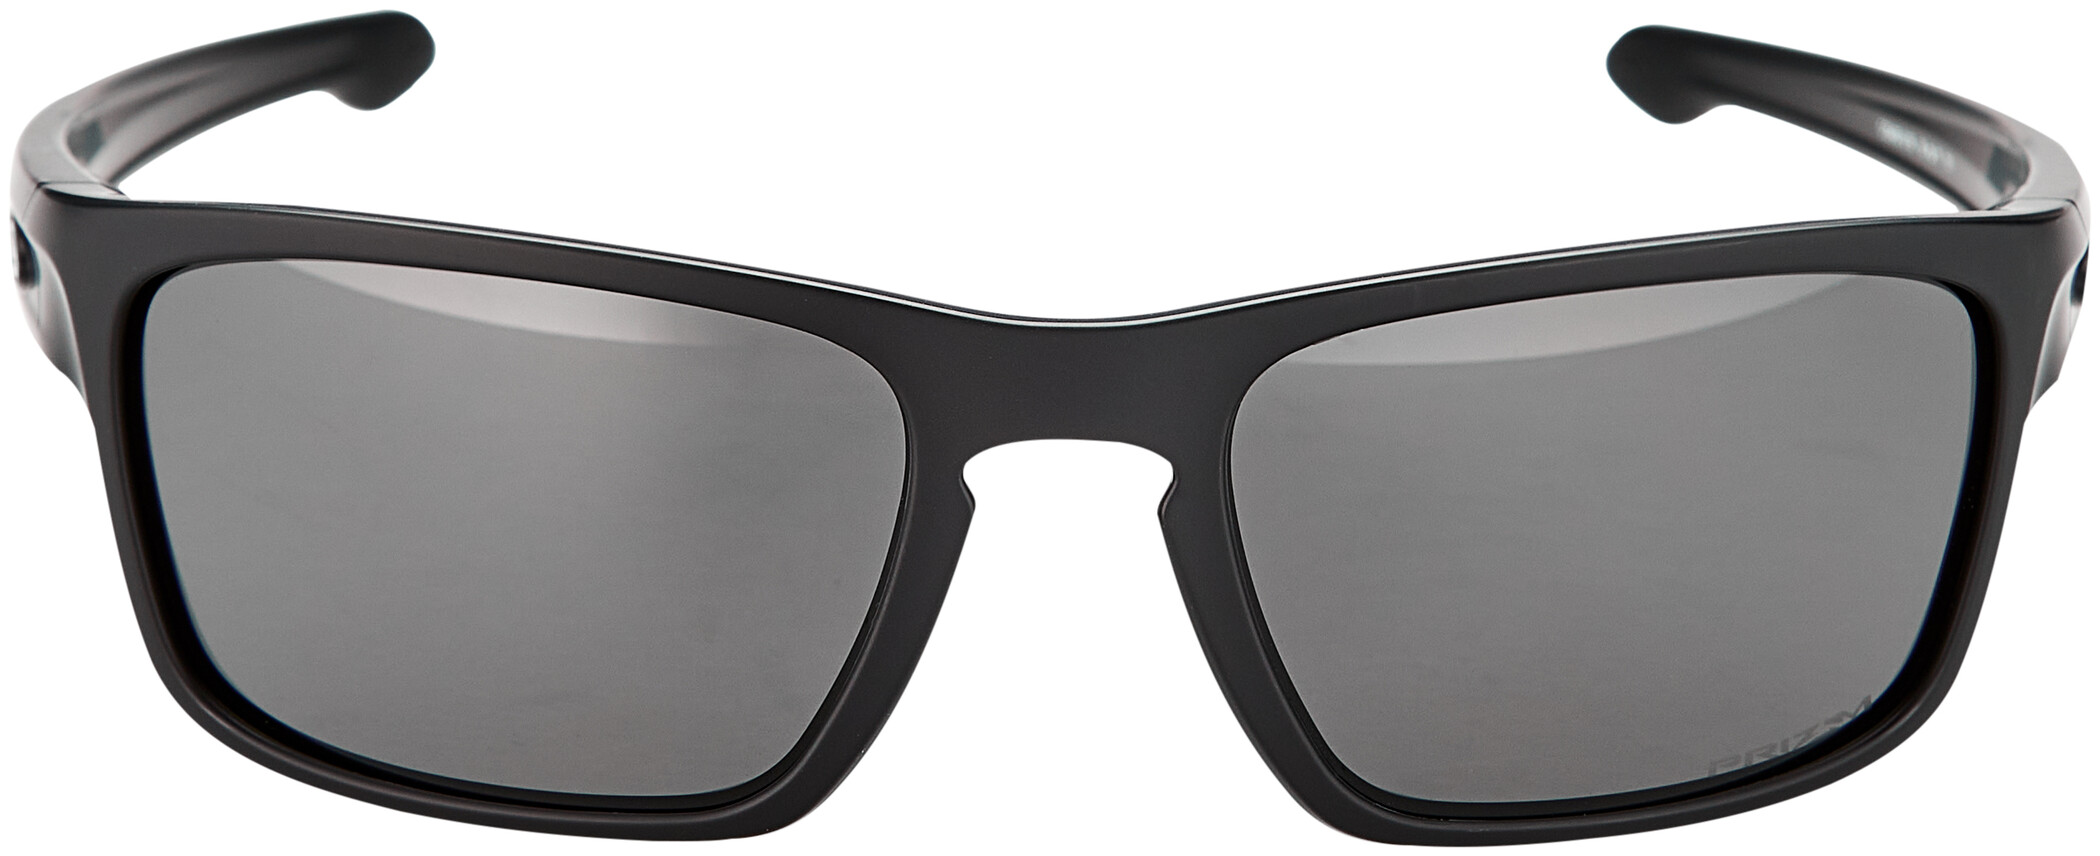 Oakley Sliver Stealth Sonnenbrille matte blackprizm grey